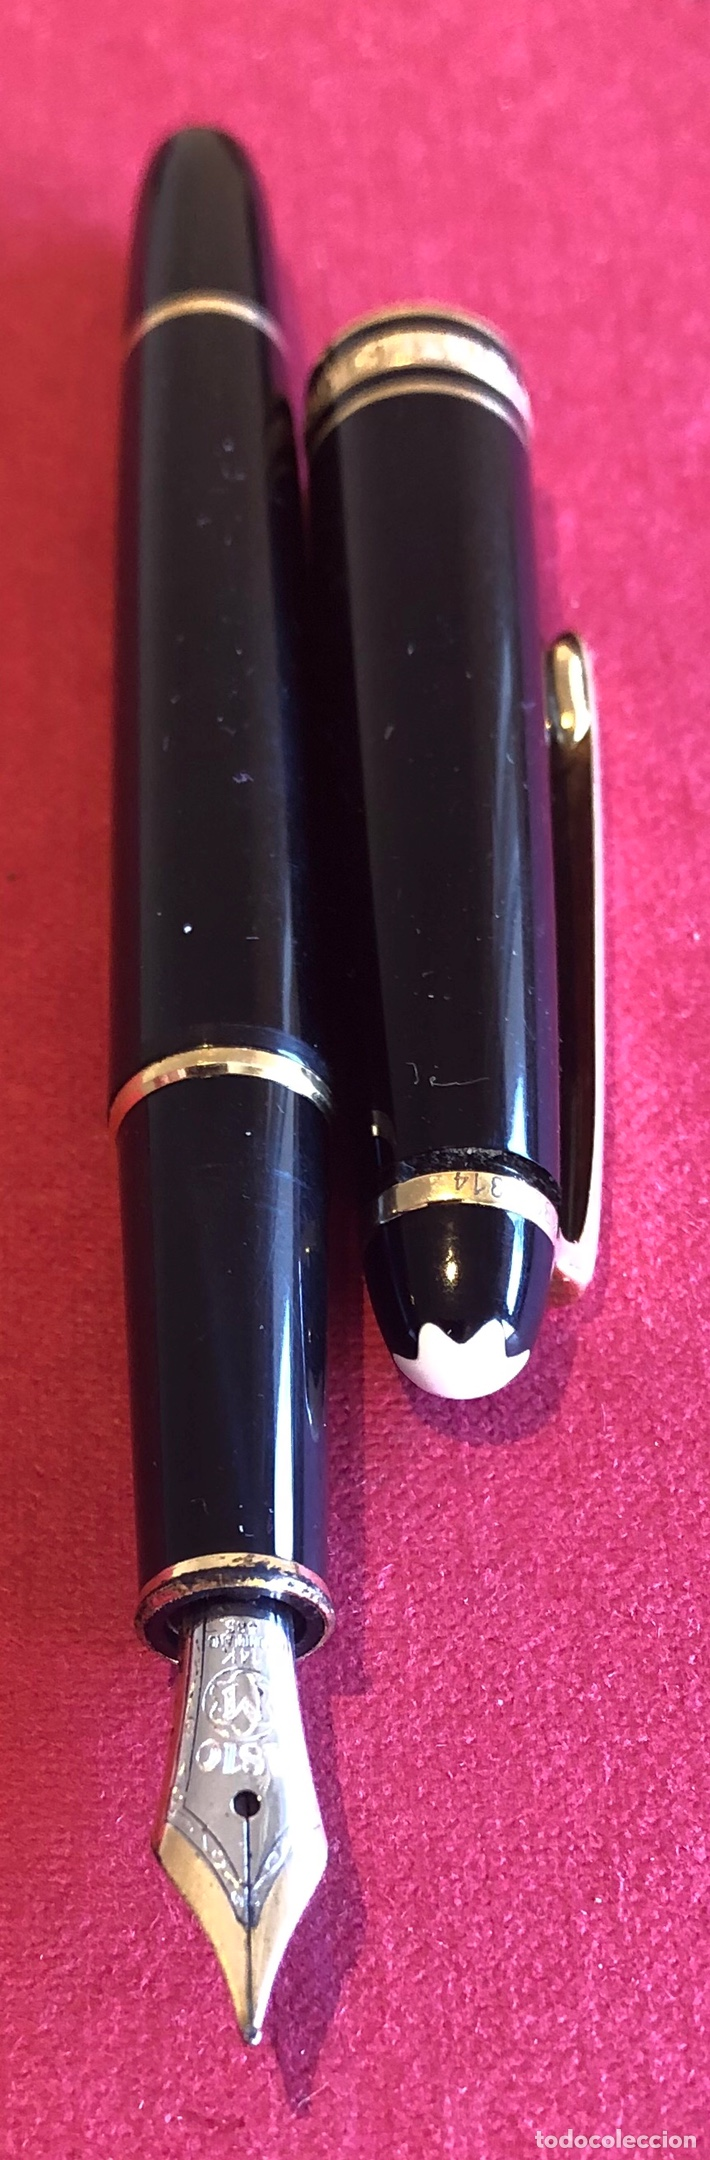 Plumas estilográficas antiguas: Pluma estilografica Montblanc Meisterstuck, de resina negra, con estuche original. - Foto 5 - 213380968